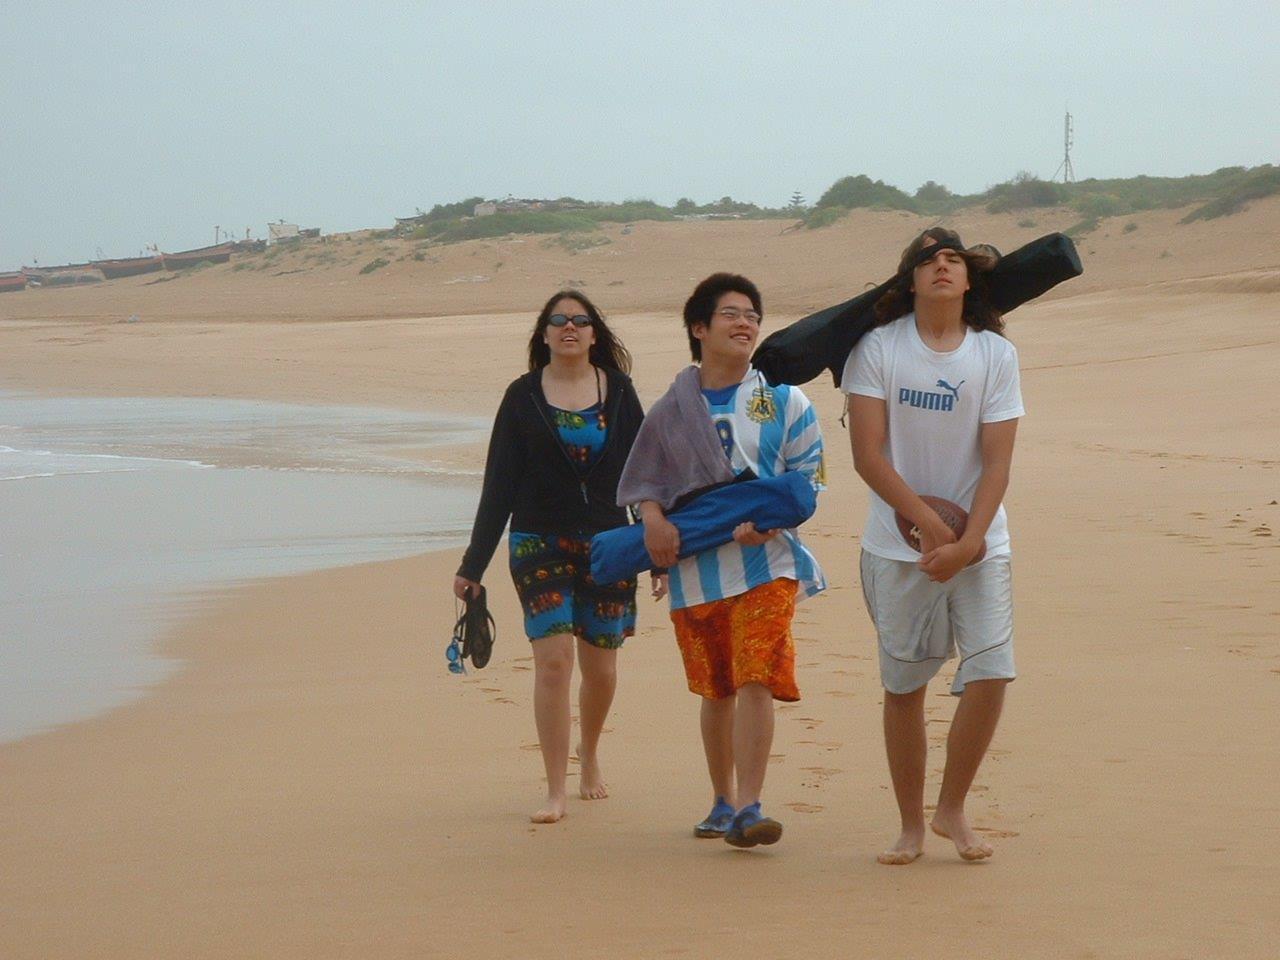 Kids at oualadia 2